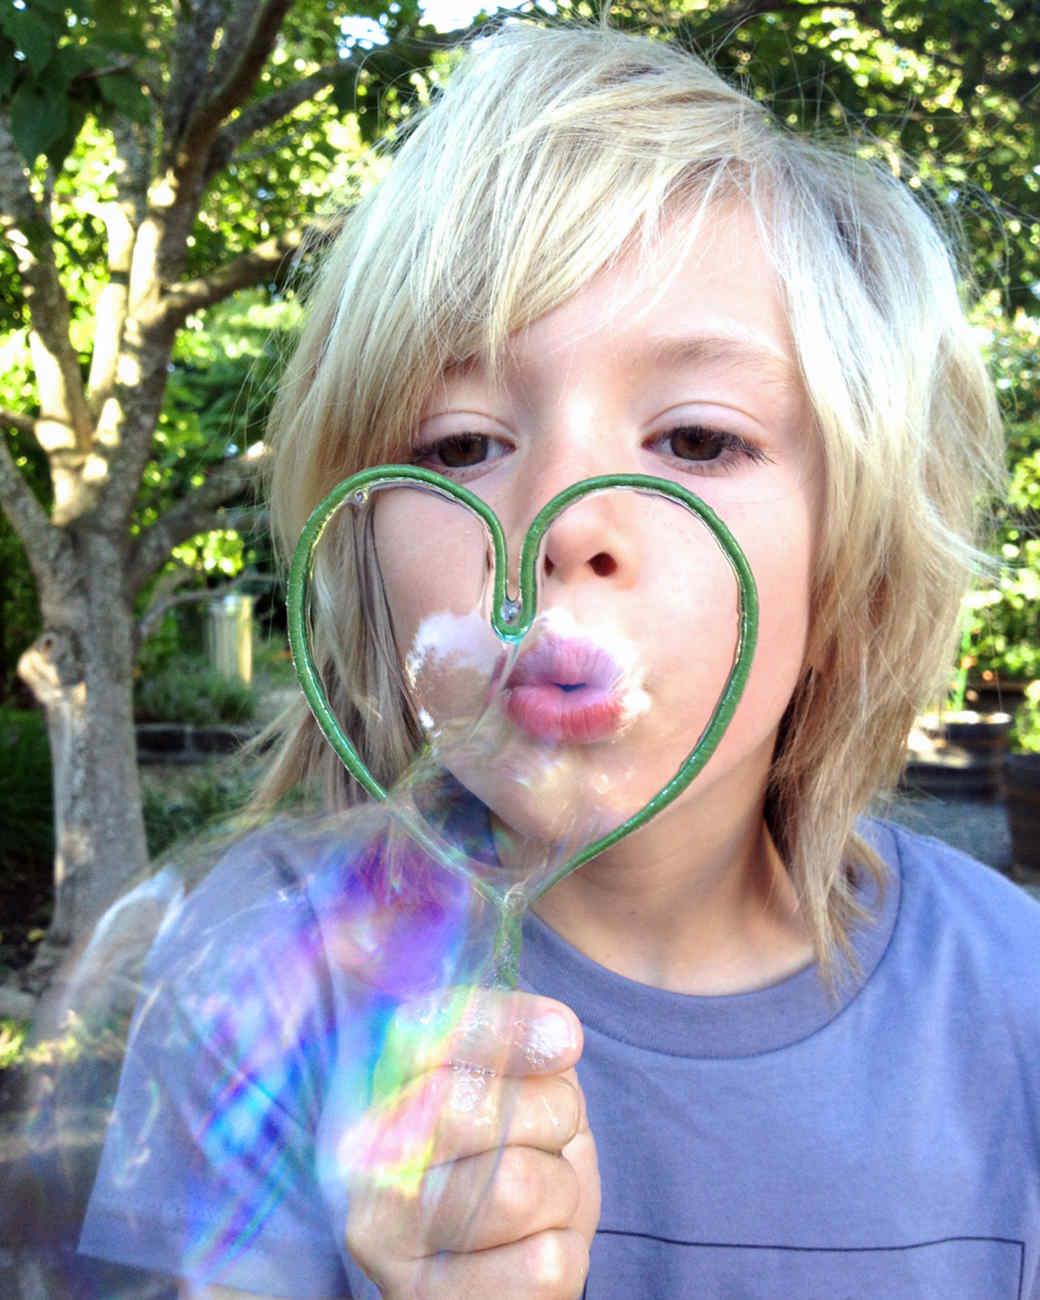 bubble-wand-poppy-haus-001-0714.jpg